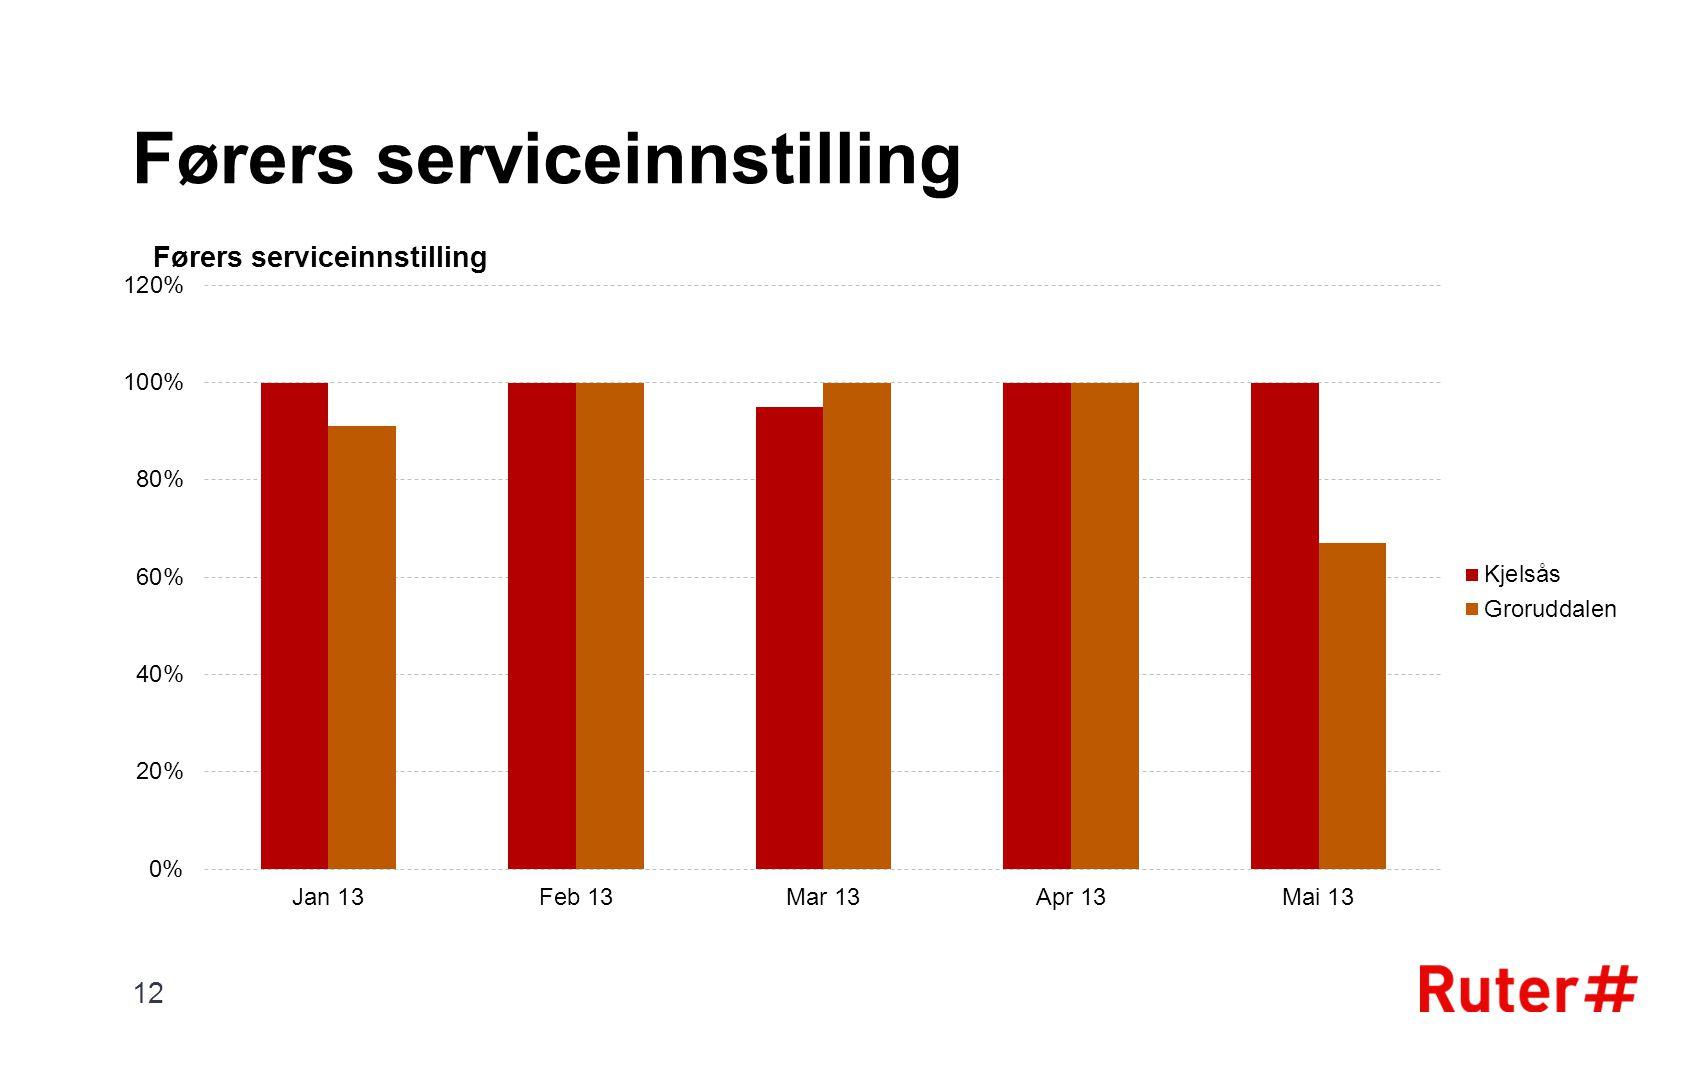 Førers serviceinnstilling 12